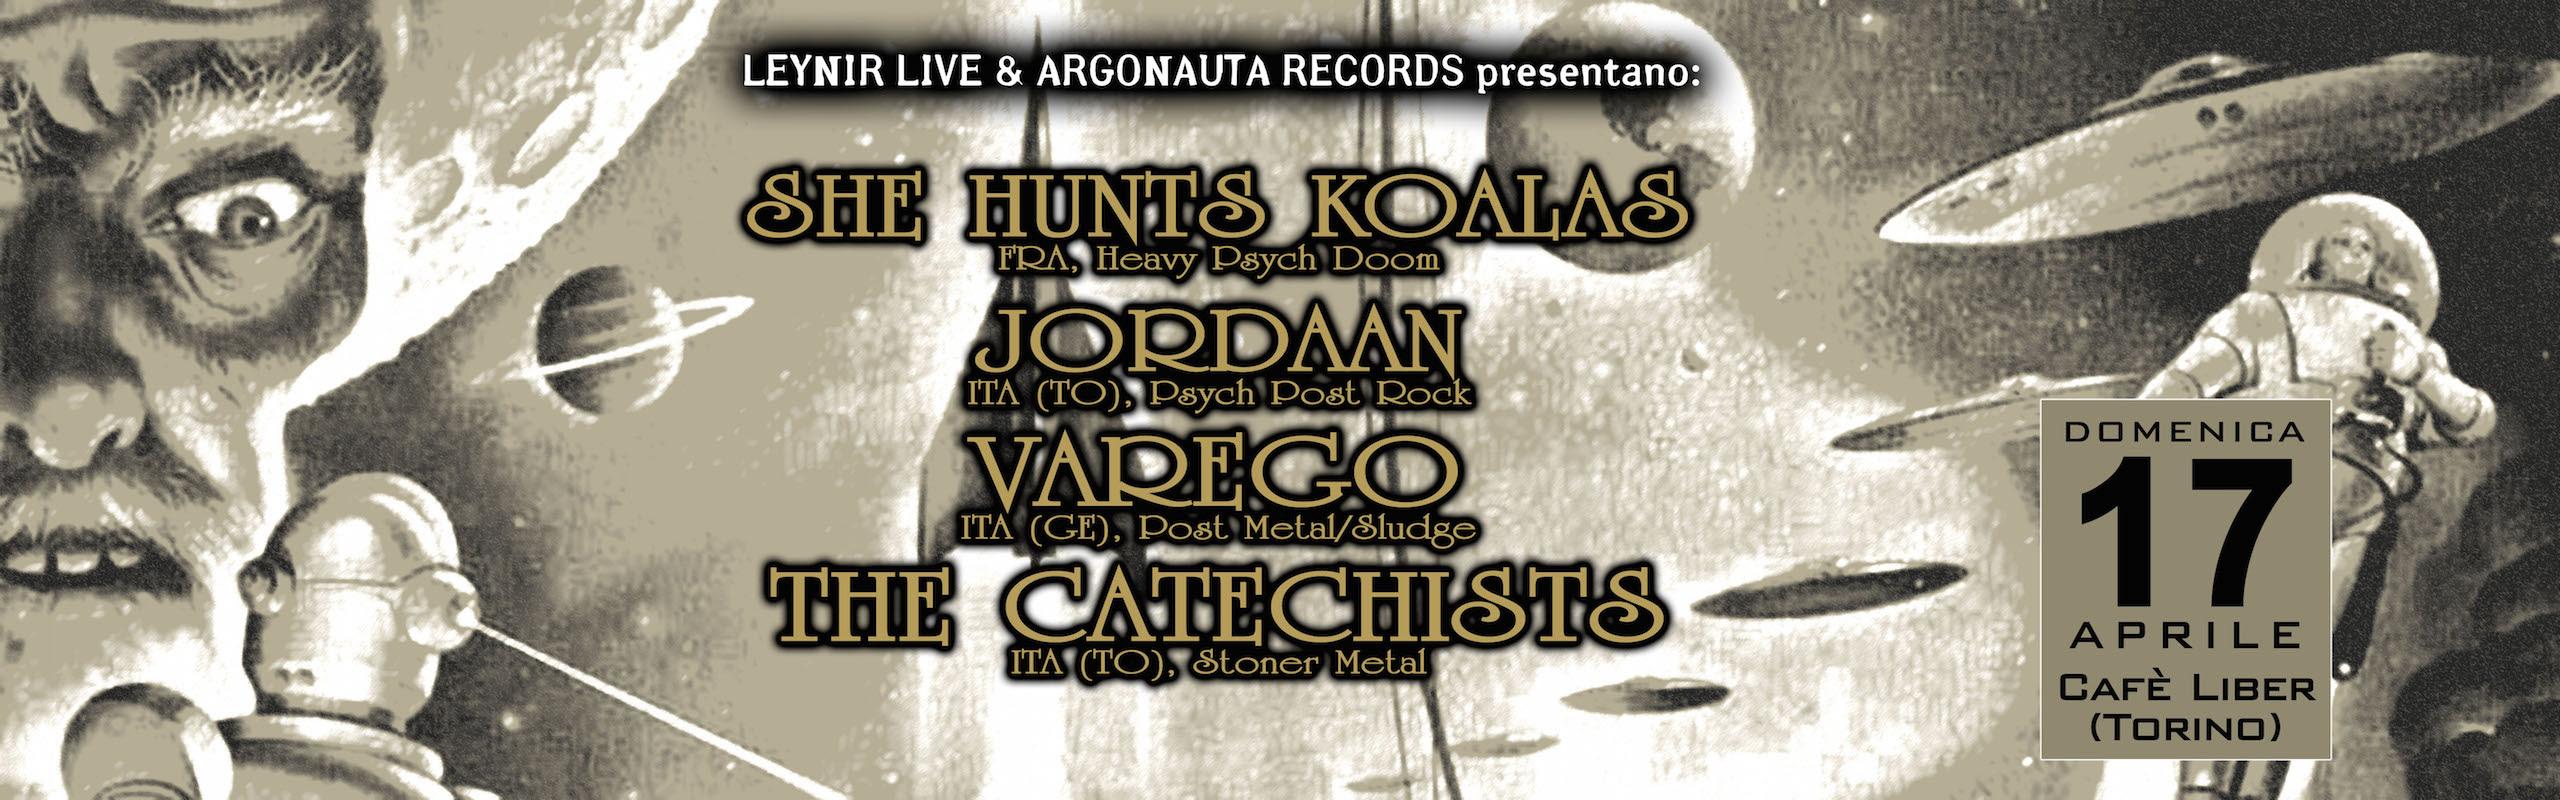 Argonauta Fest Warm Up - 2016 @ Cafè Liber - Torino